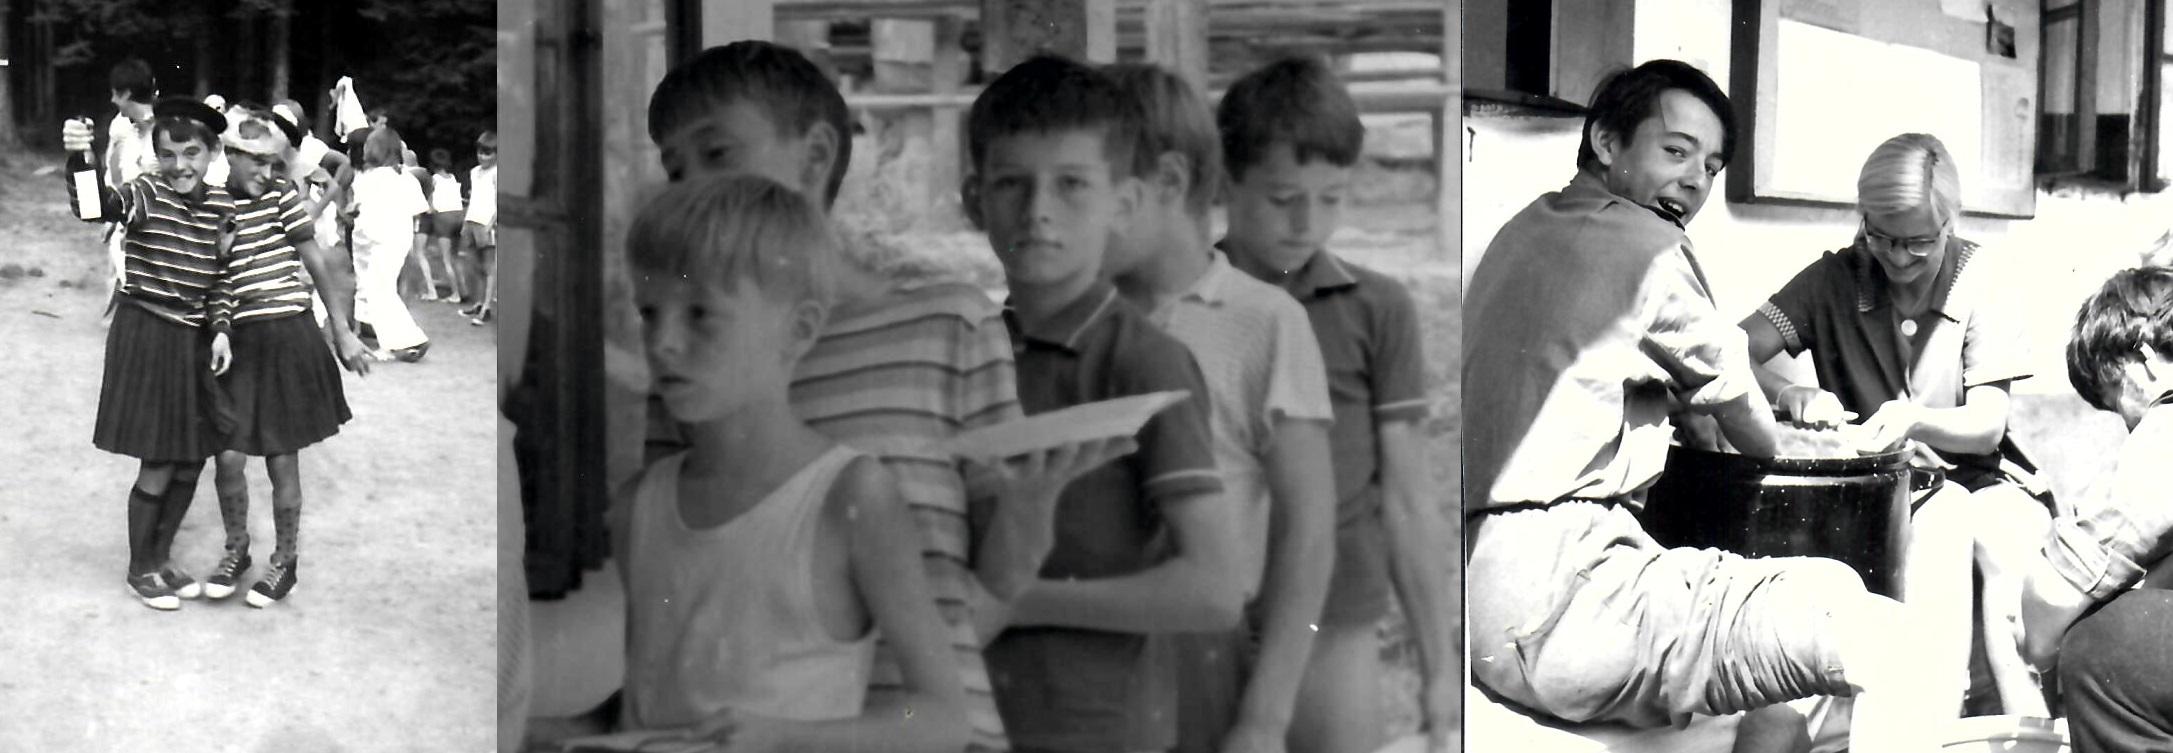 https://www.rudolfaci.cz/wp-content/uploads/2020/11/1966_1967_prvni_tabor.jpg